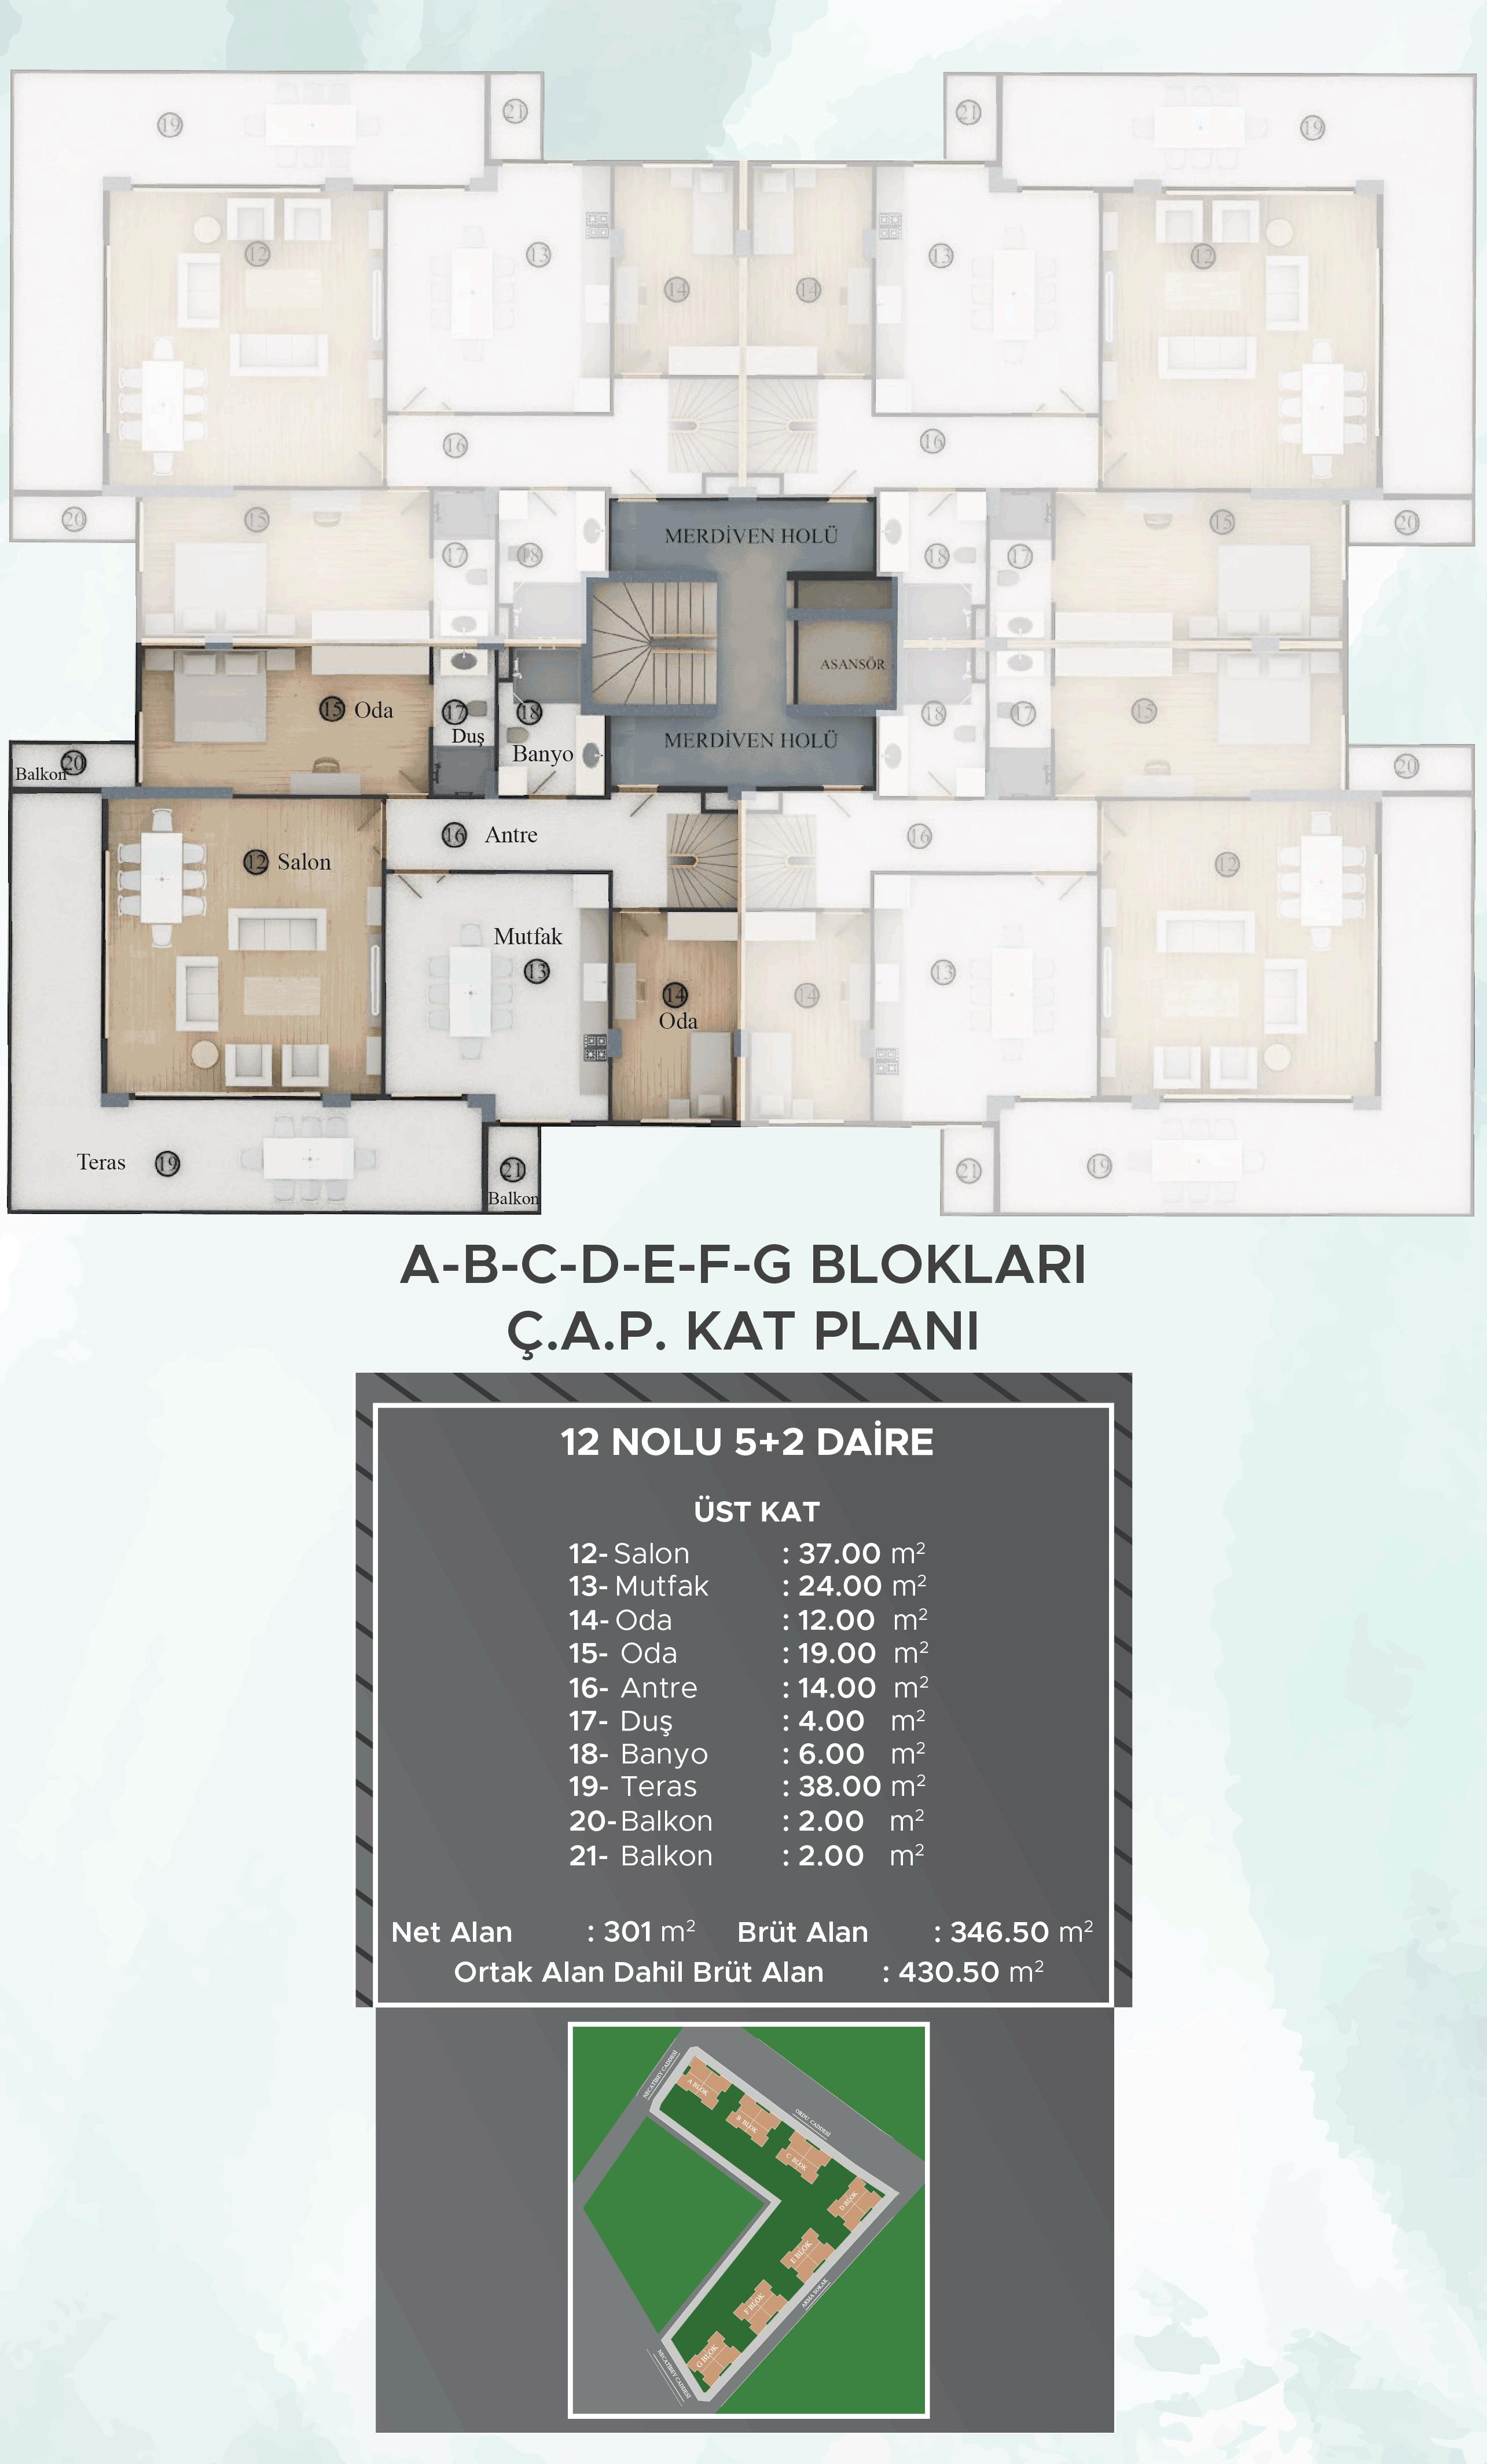 A-B-C-D-E-F-G Blokları Dubleks Ç.A.P. Kat Planları